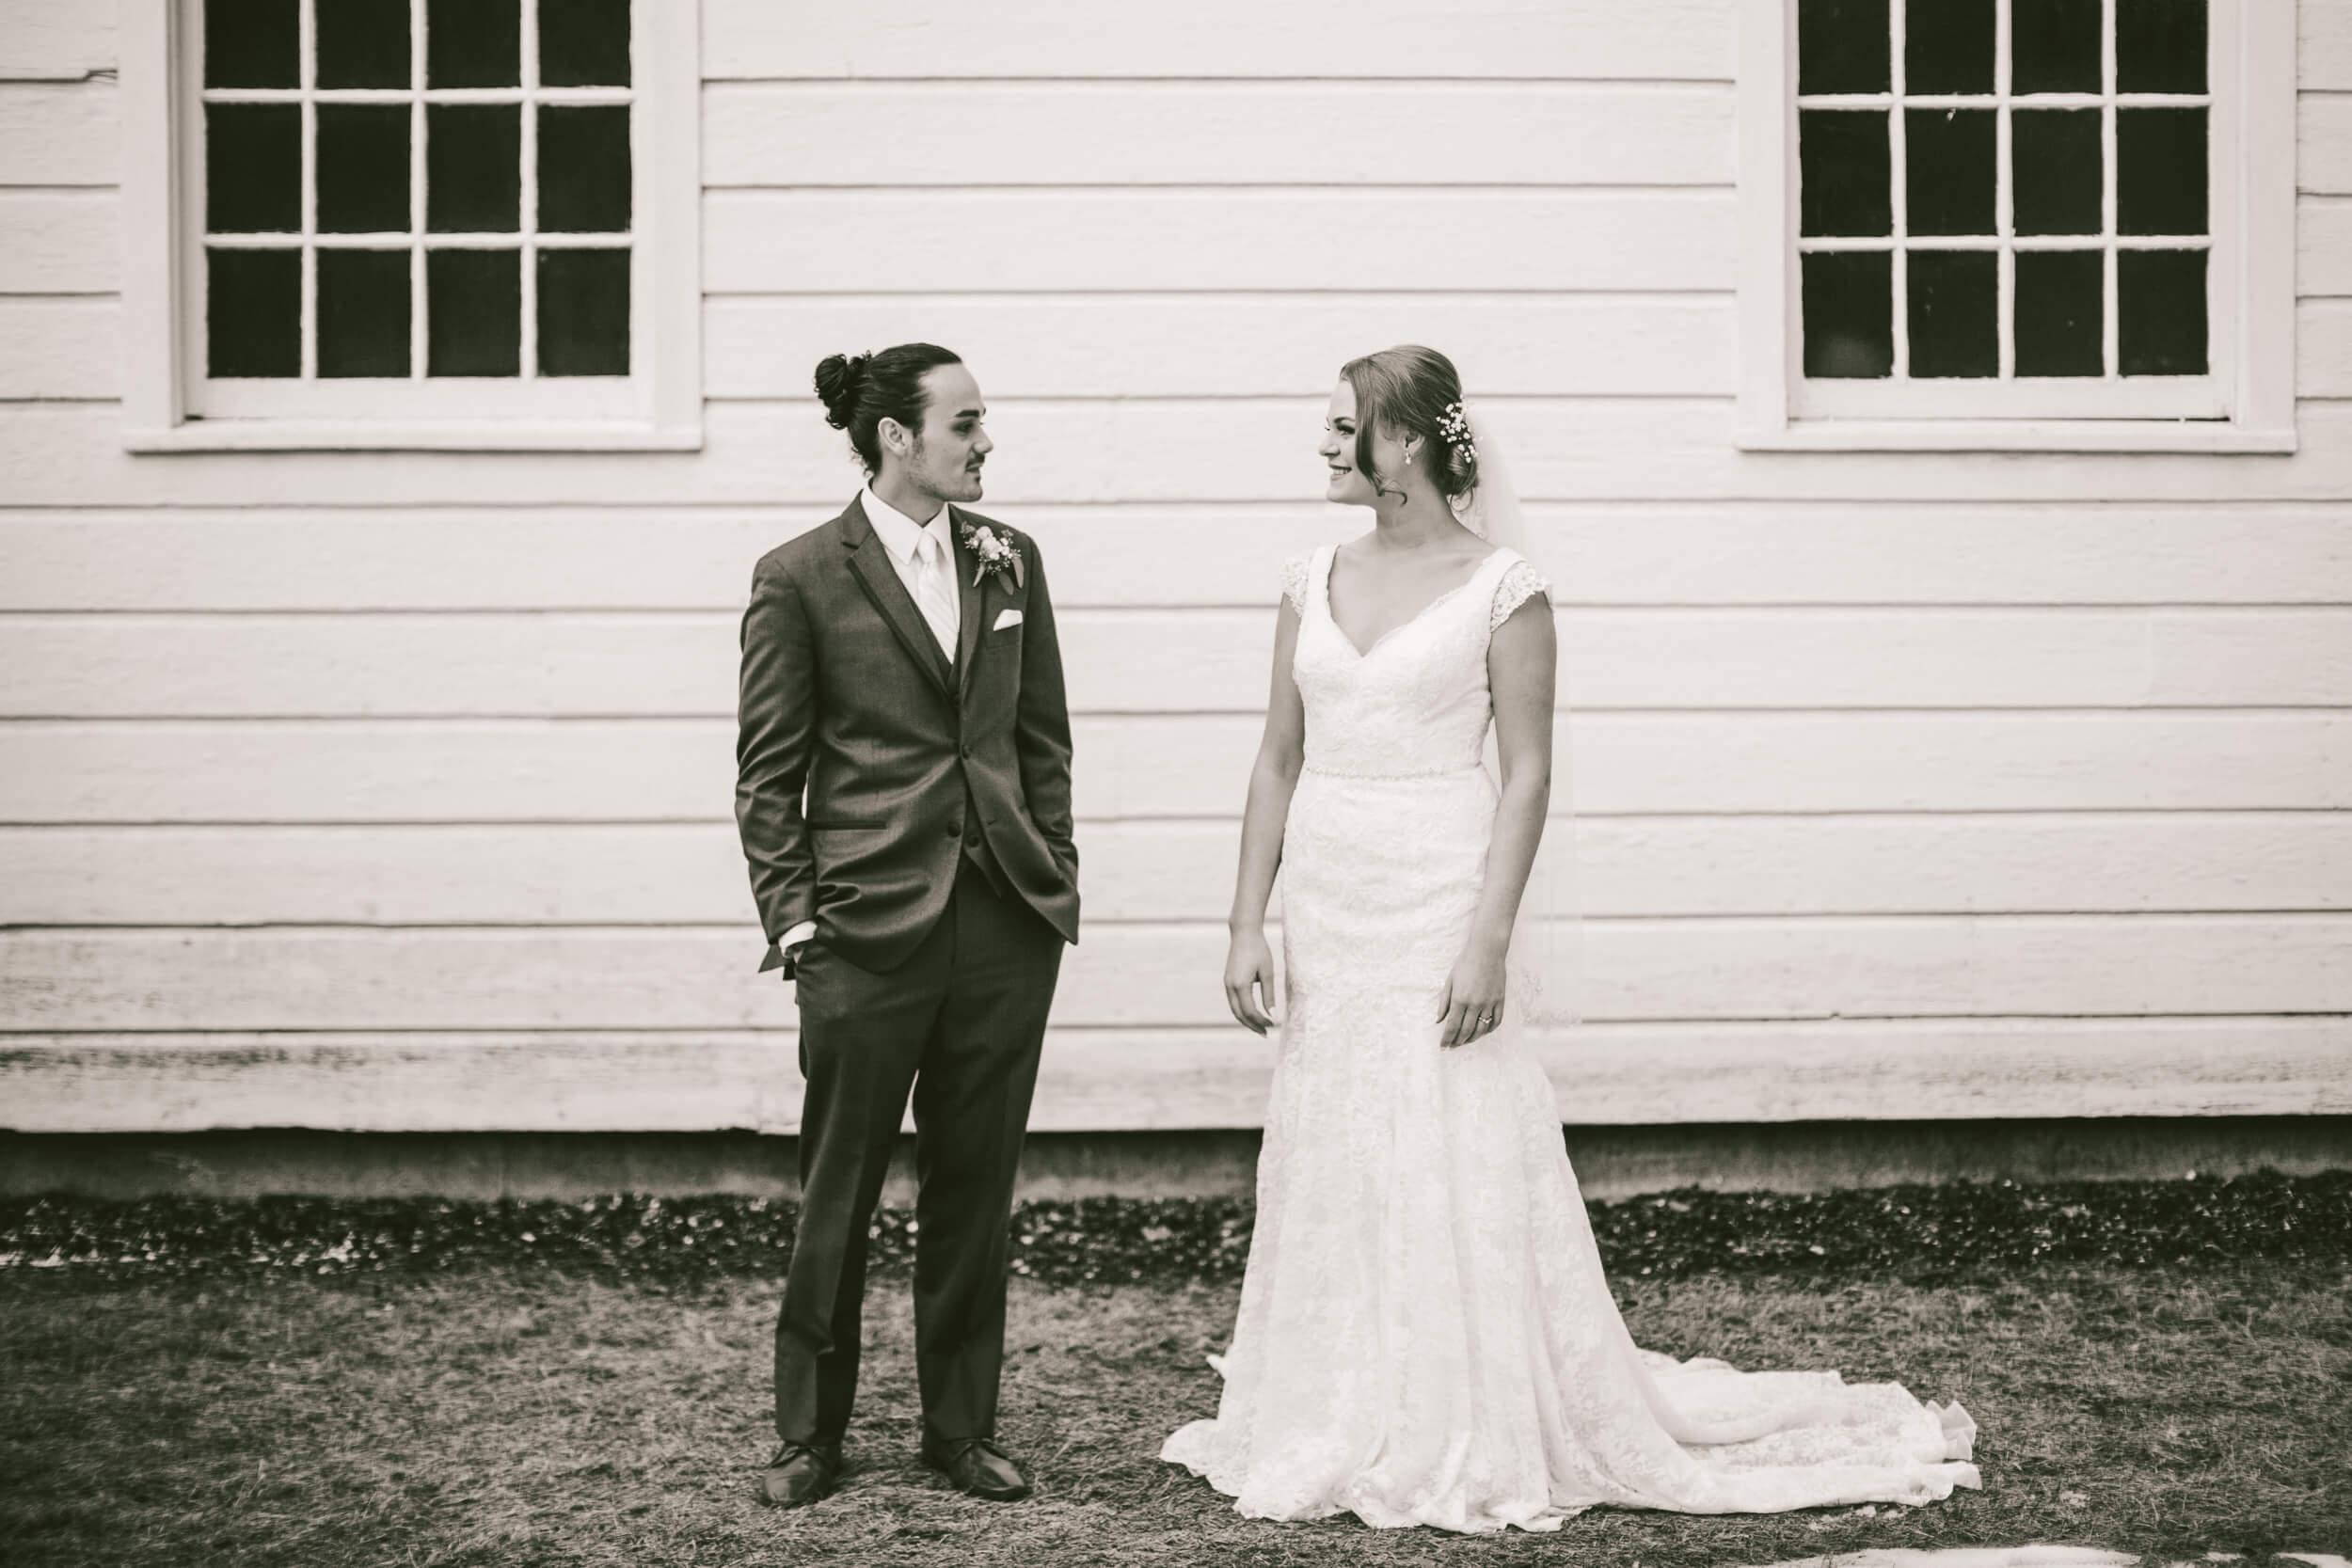 mukogawa winter wedding in spokane (87).jpg